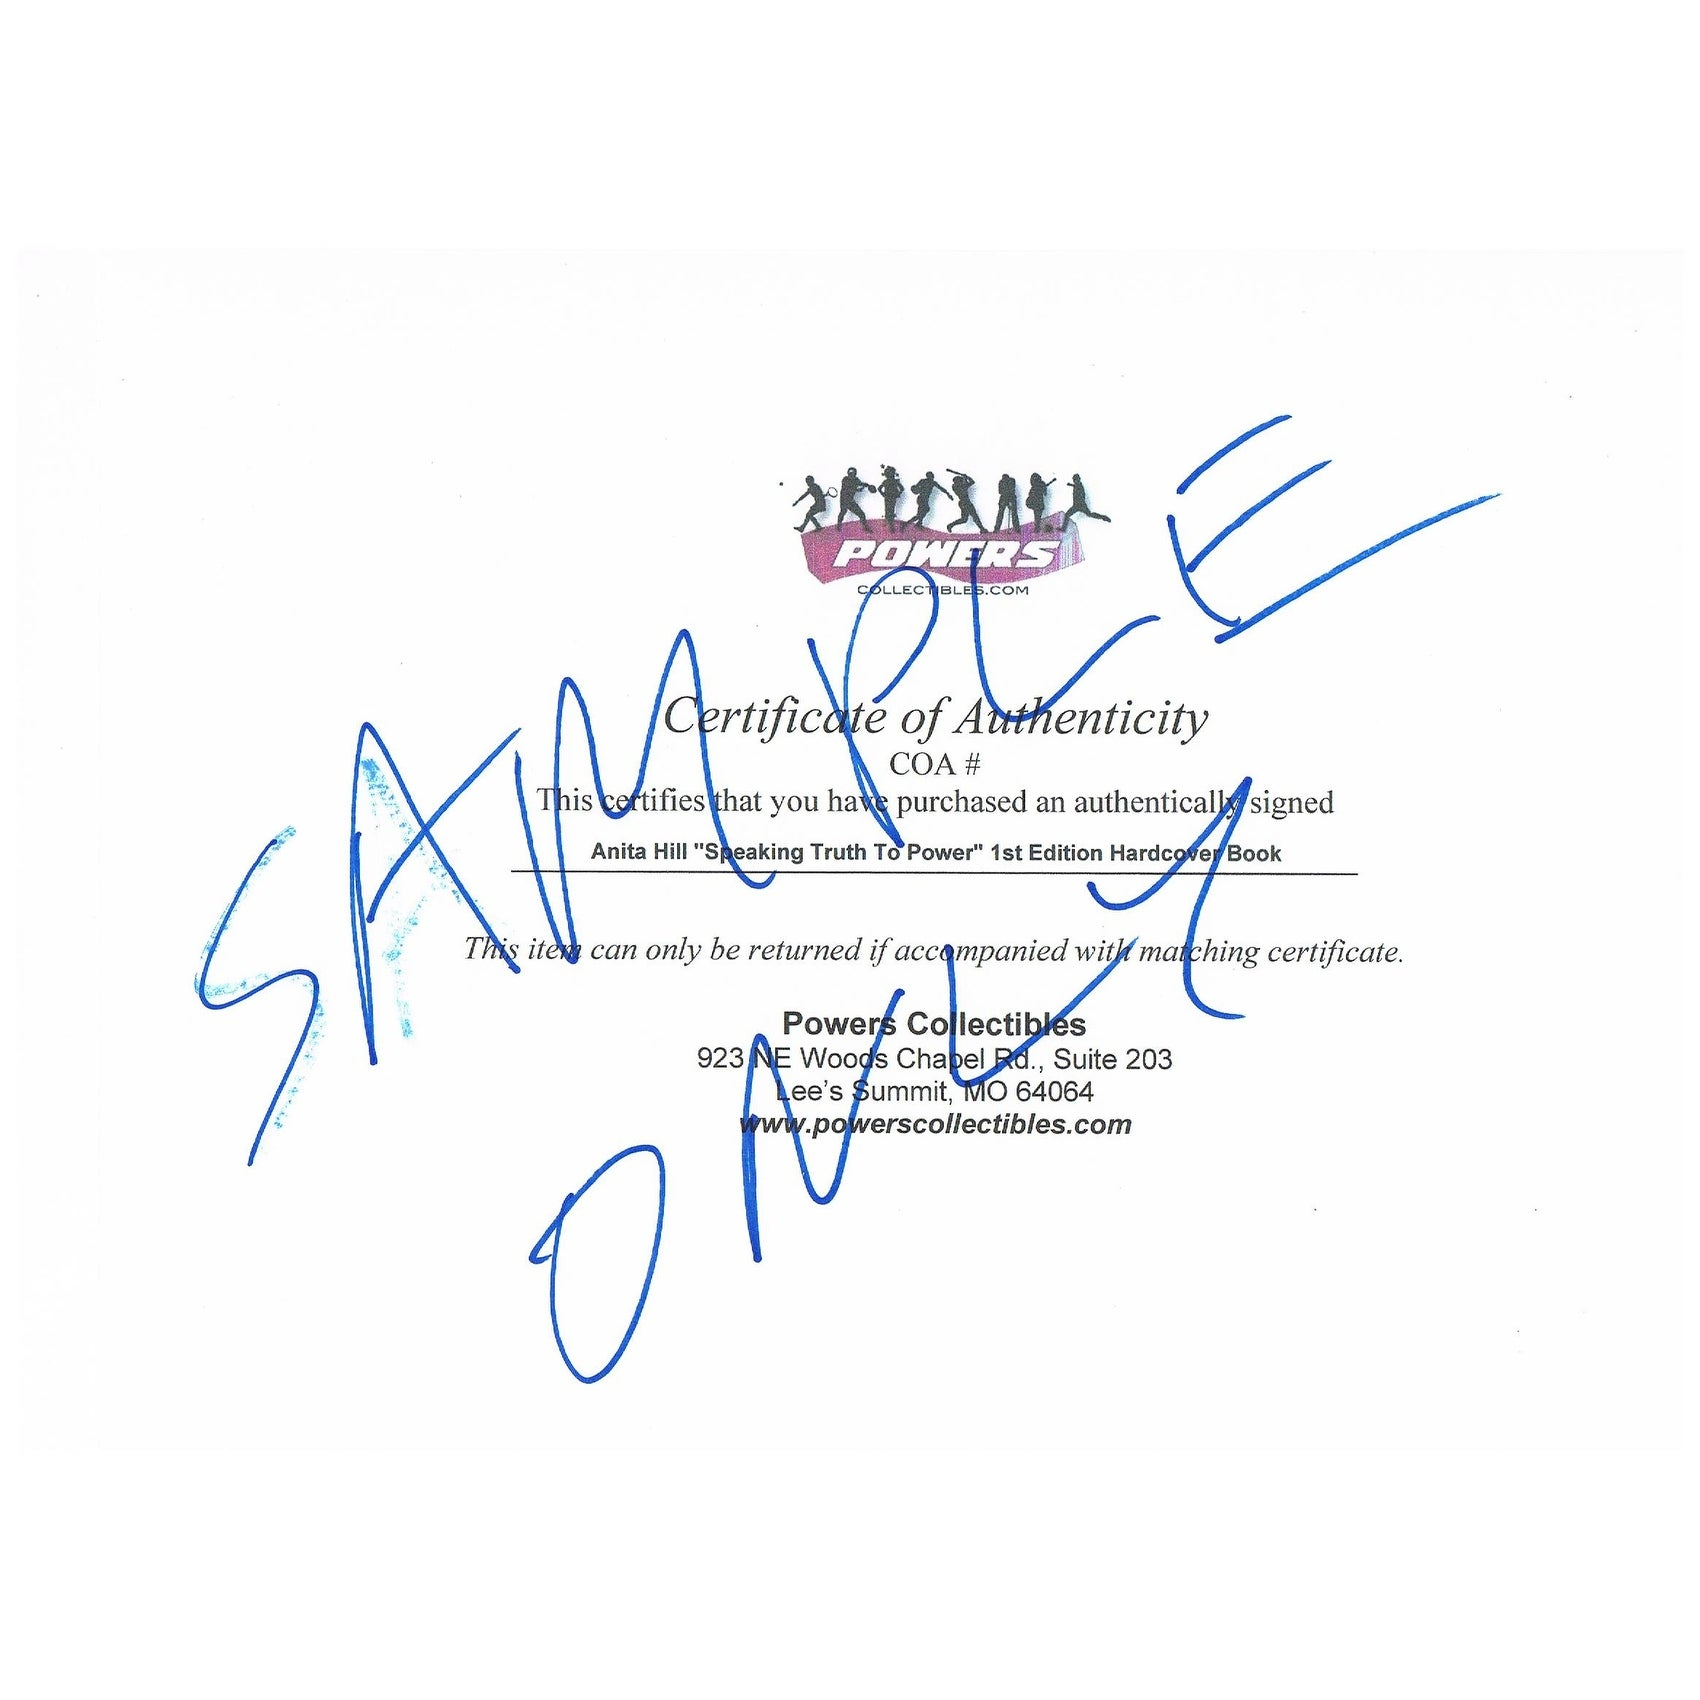 Photographs Autographs-original Amy Adams Signed 11x14 Photo Cheap Sales 50%